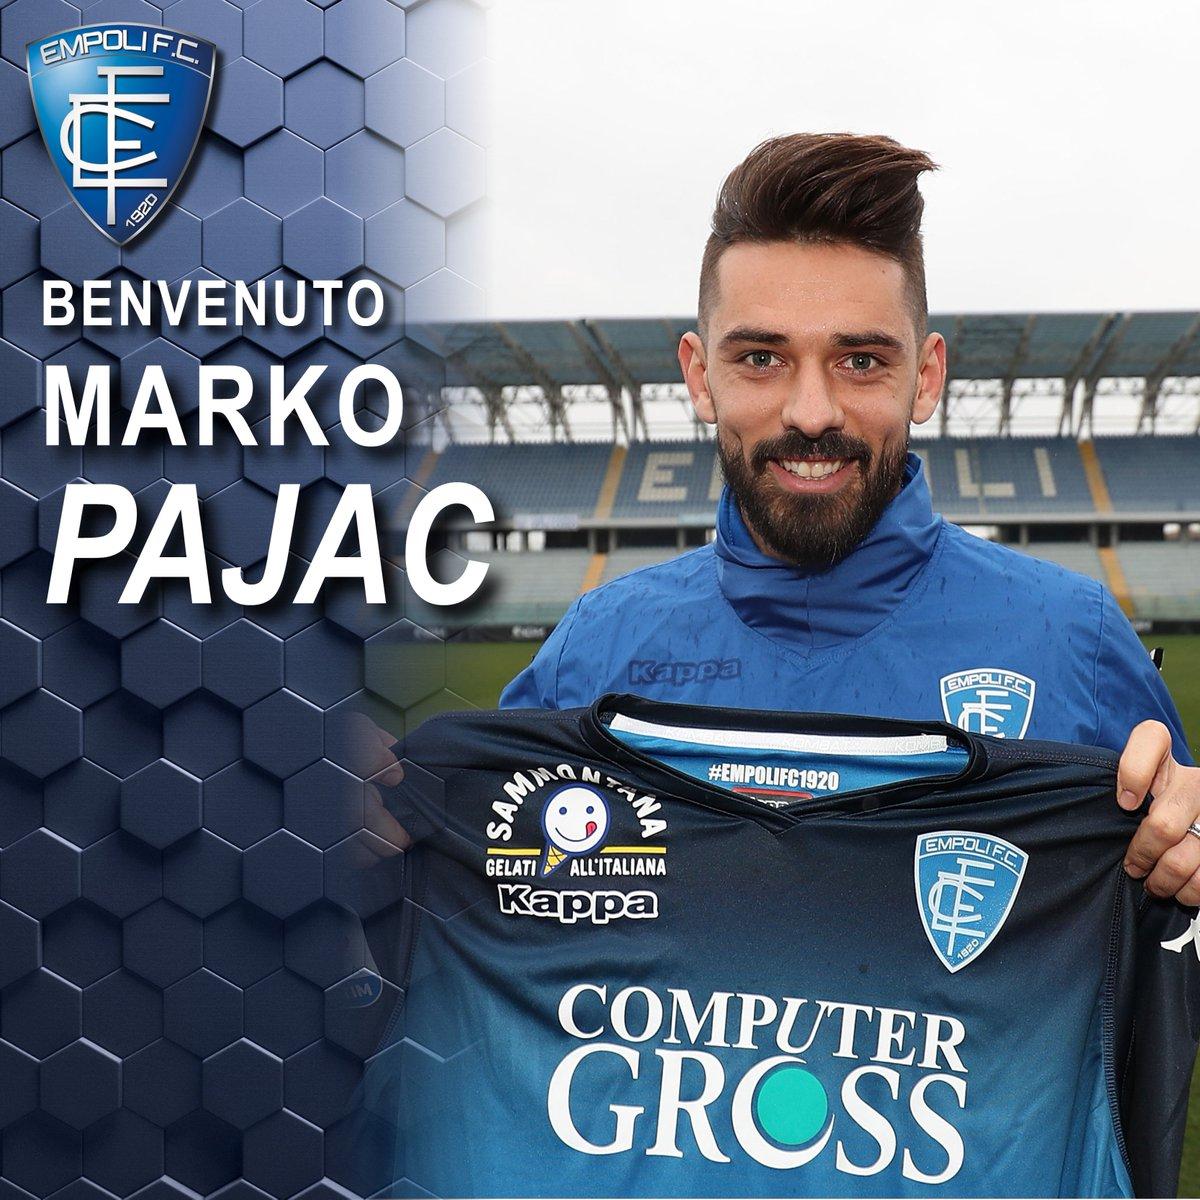 Marko Pajac